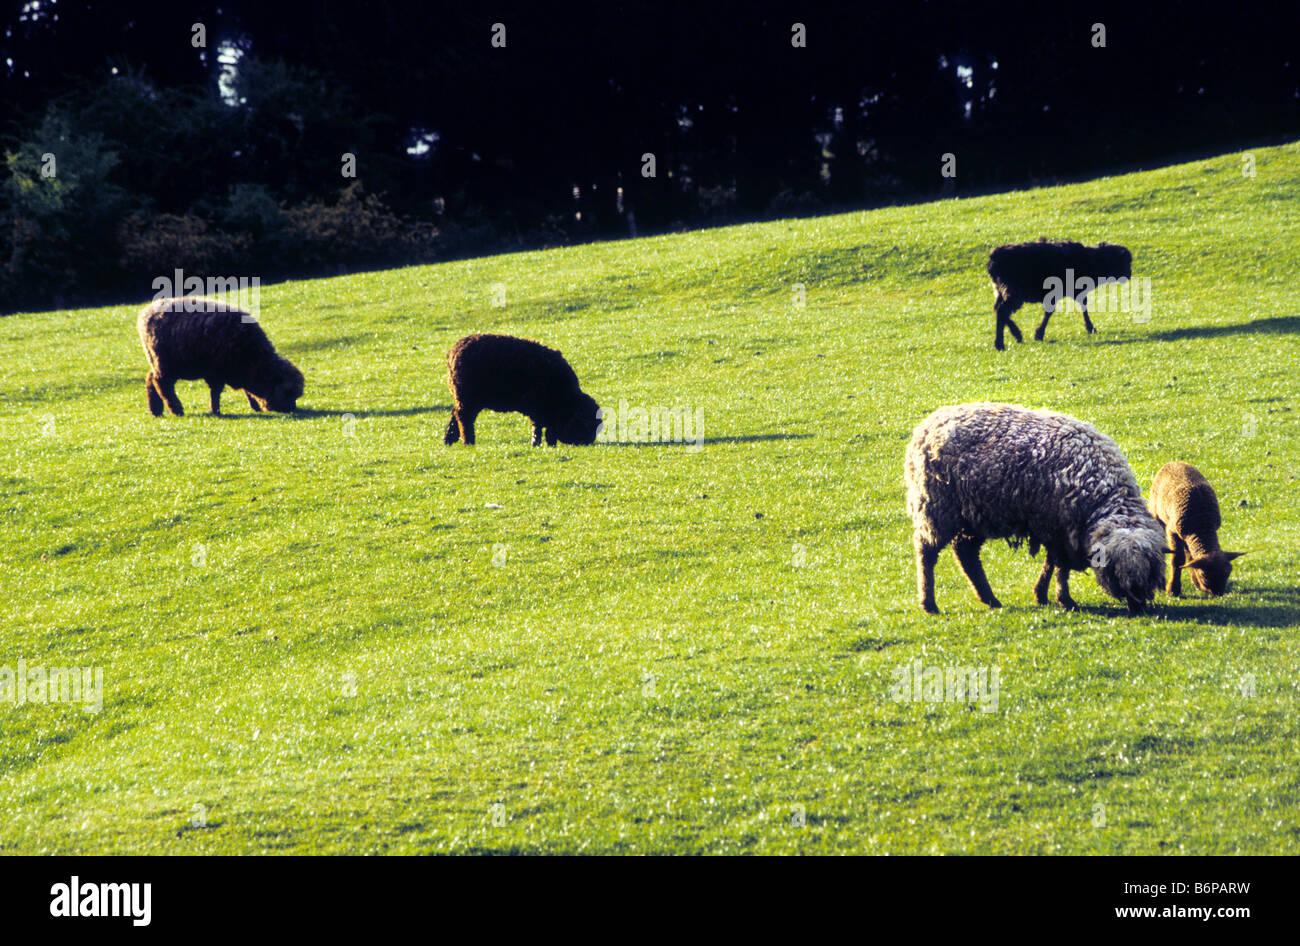 One white sheep among group of black sheep, Australia - Stock Image